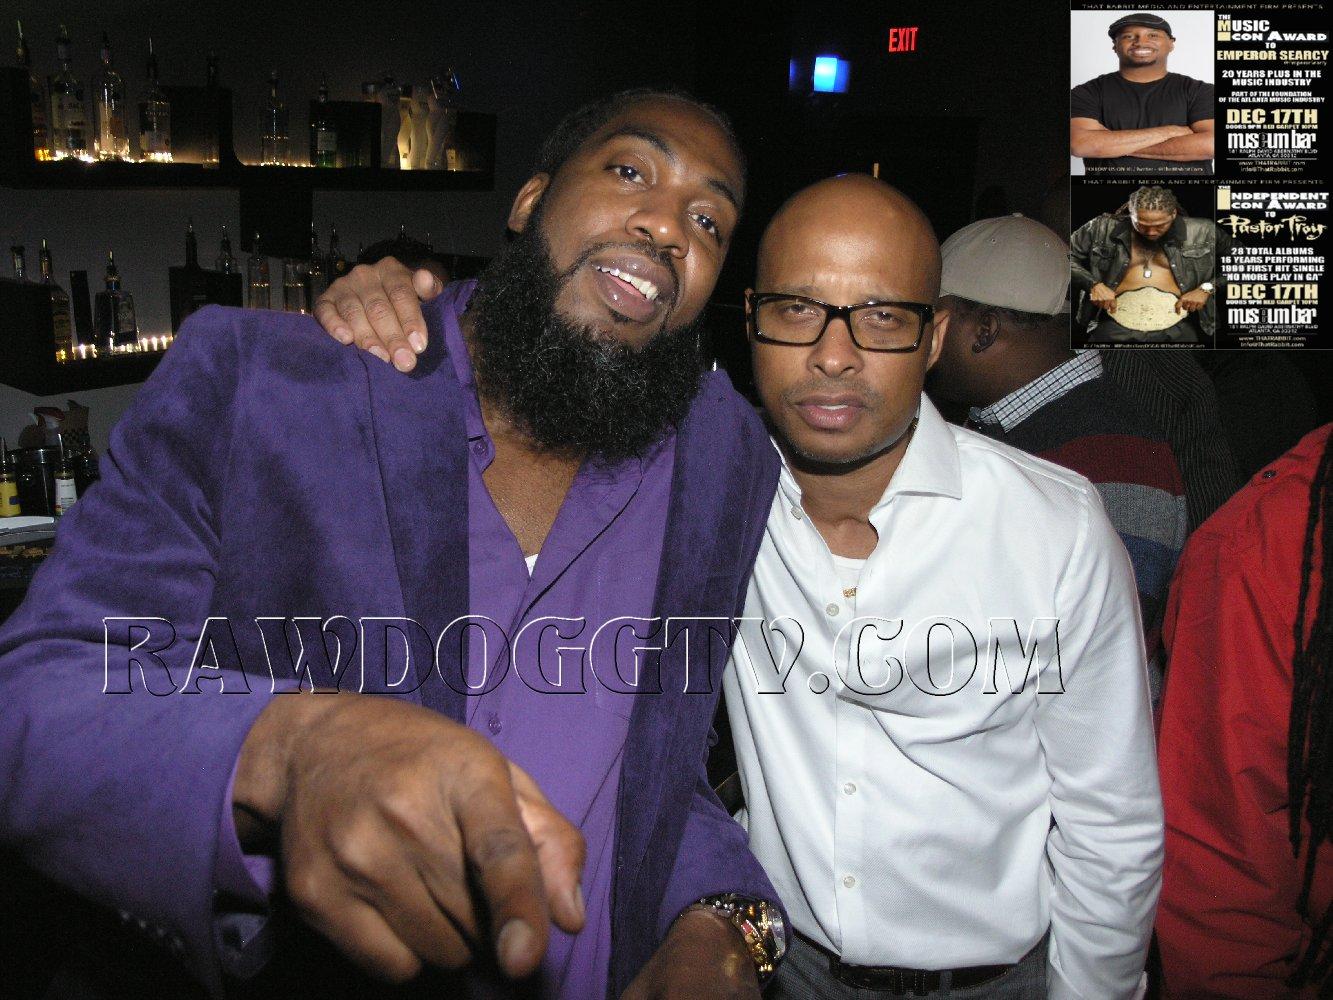 ThatRabbit Magazine Photos-ATL Legends Reunion-The Music Icon Award-Museum Bar Atlanta-Ray Hamilton- dec 17 2015 RAWDOGGTV 305-490-2182 (113)